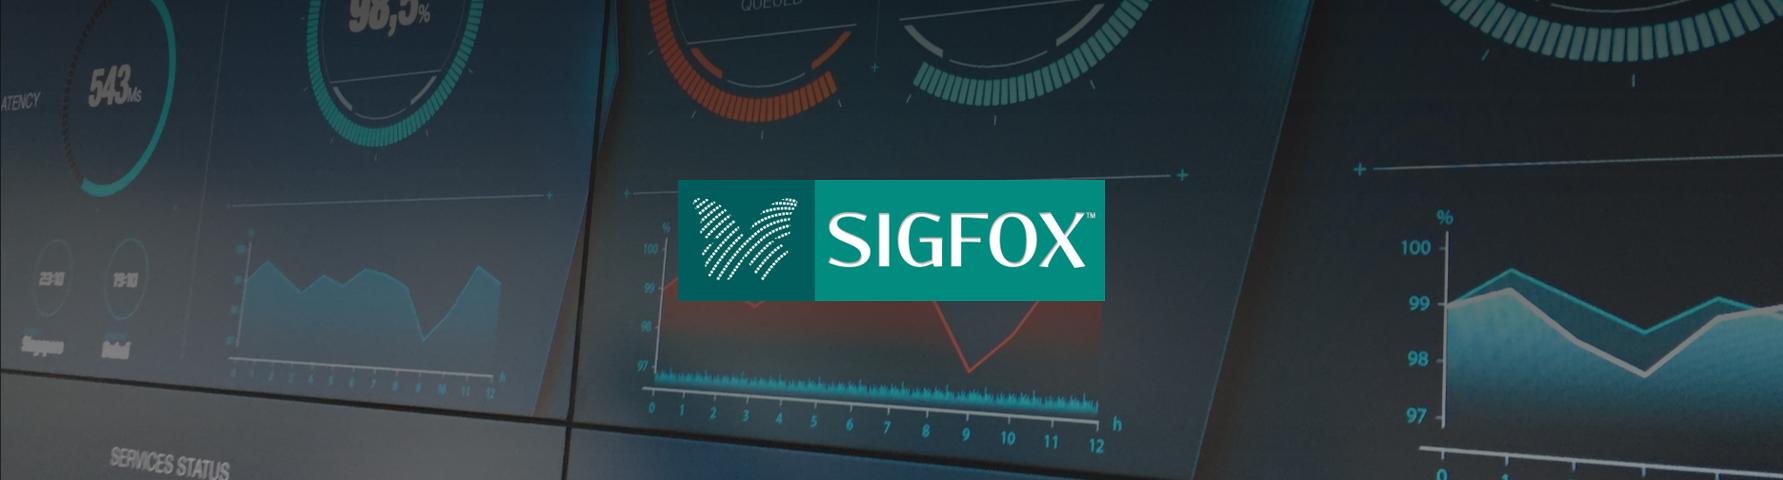 sigfox-case